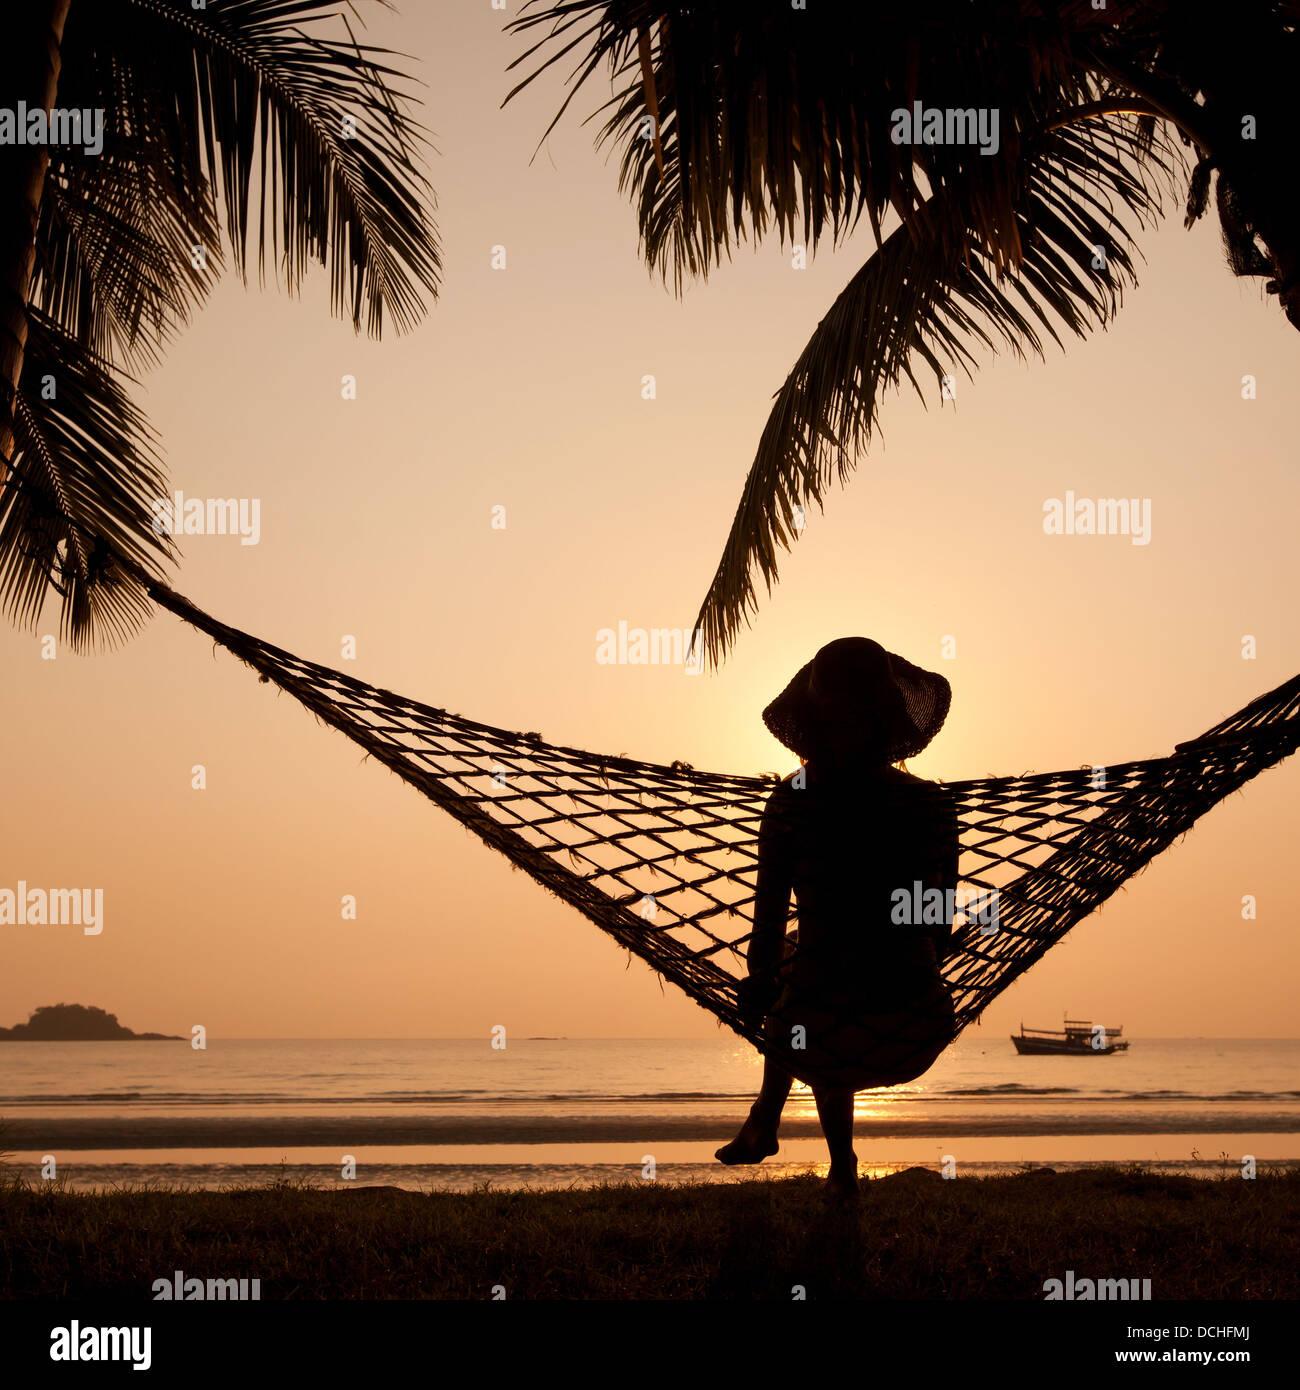 Frau in Hängematte Sonnenuntergang am Strand Stockbild